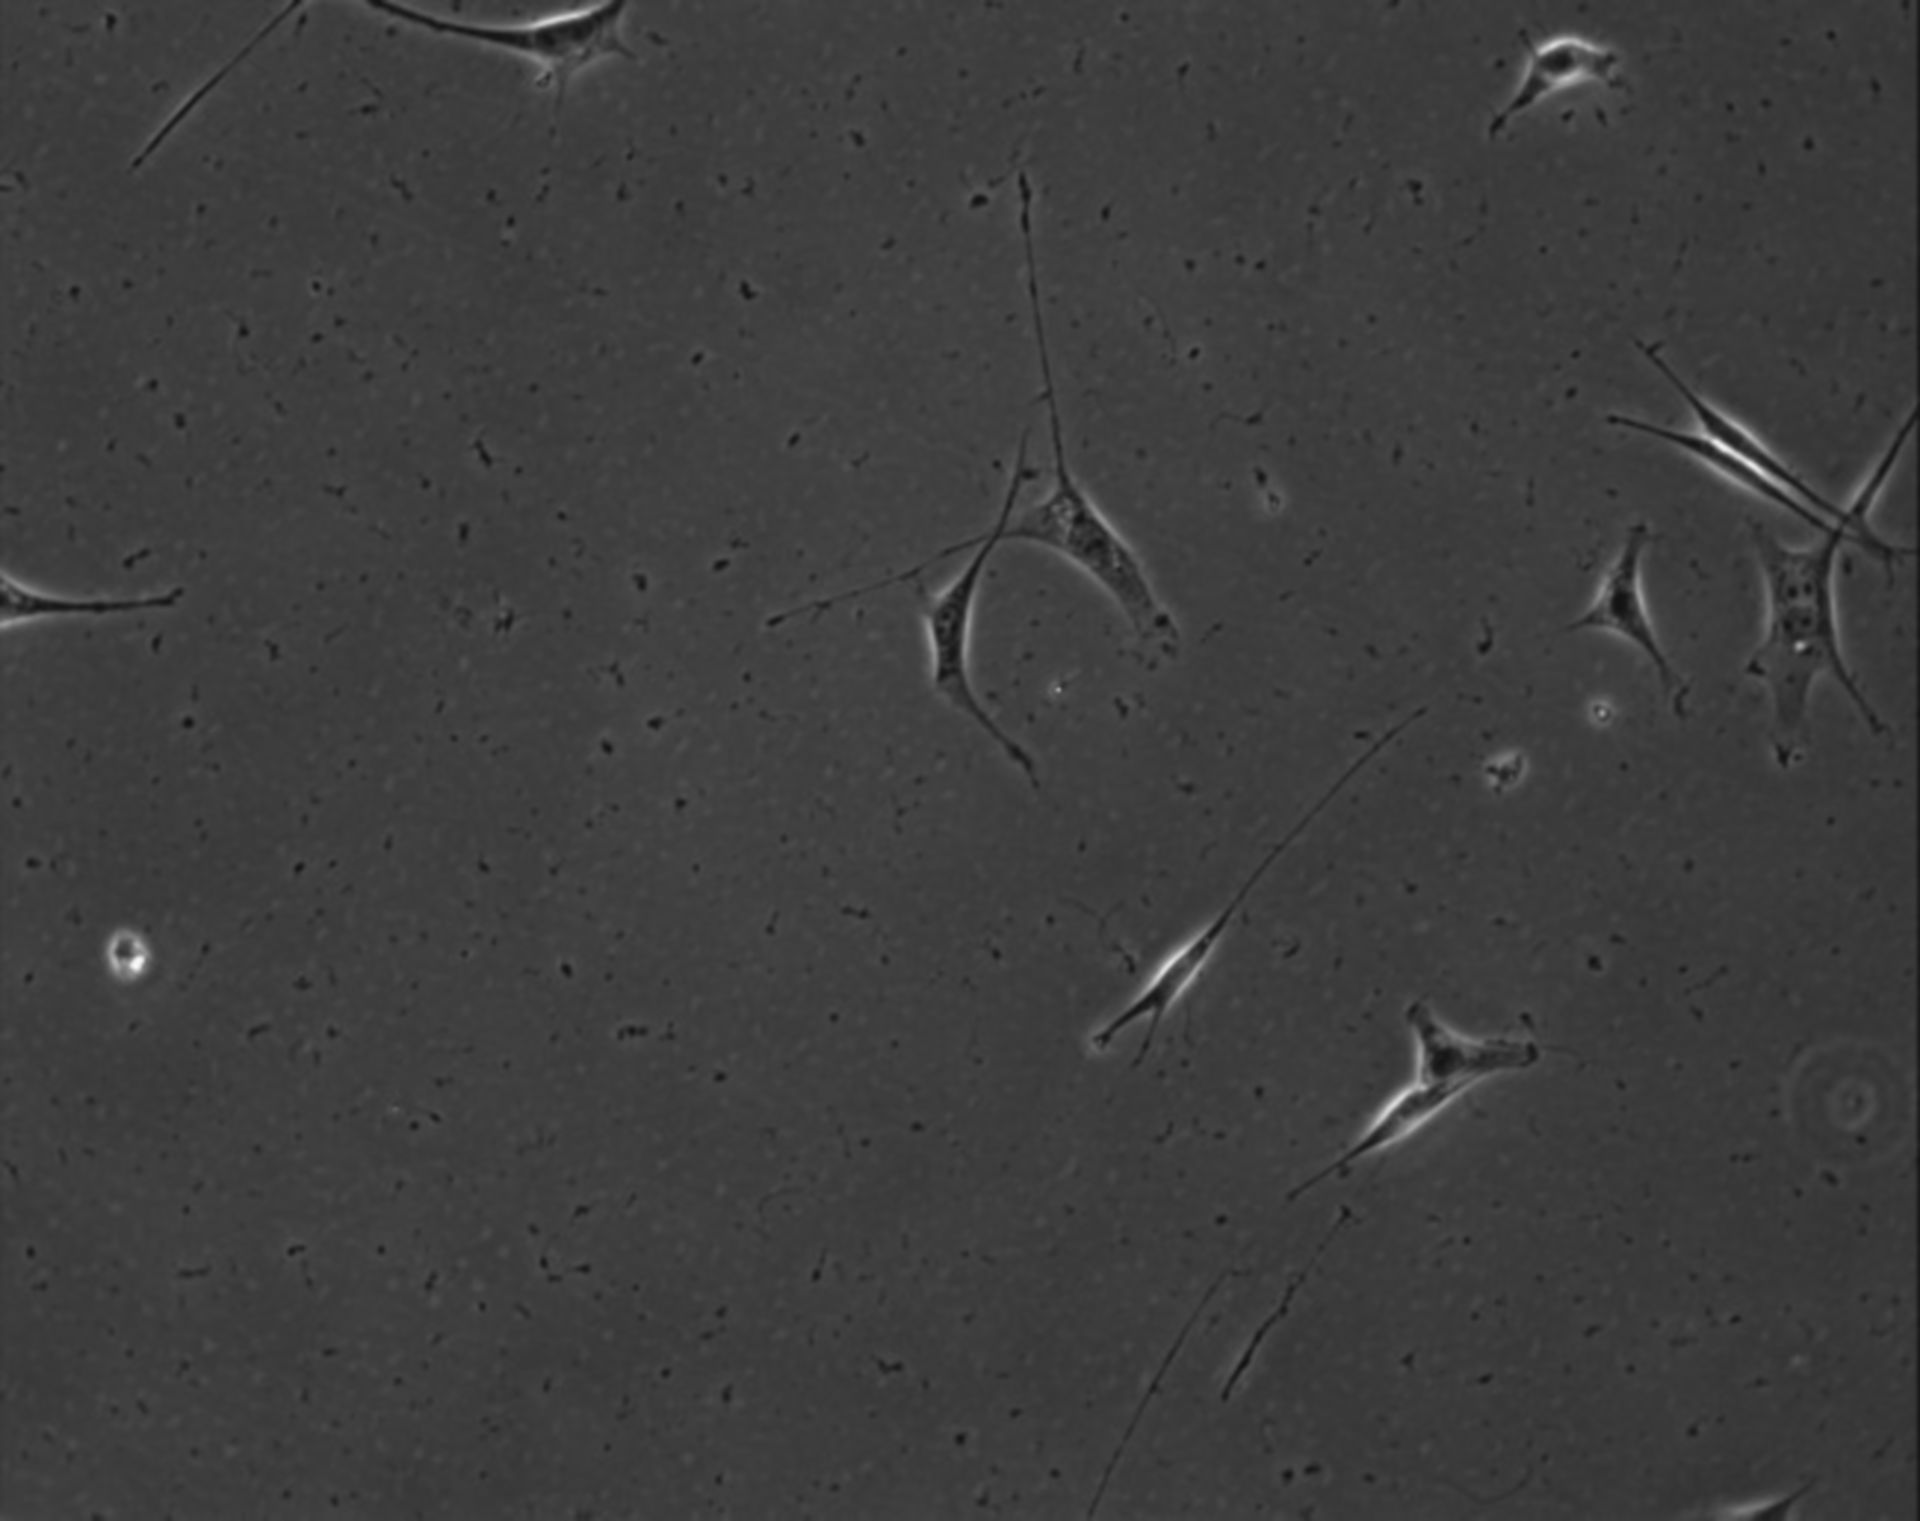 Mus musculus (Extracellular matrix part) - CIL:7888